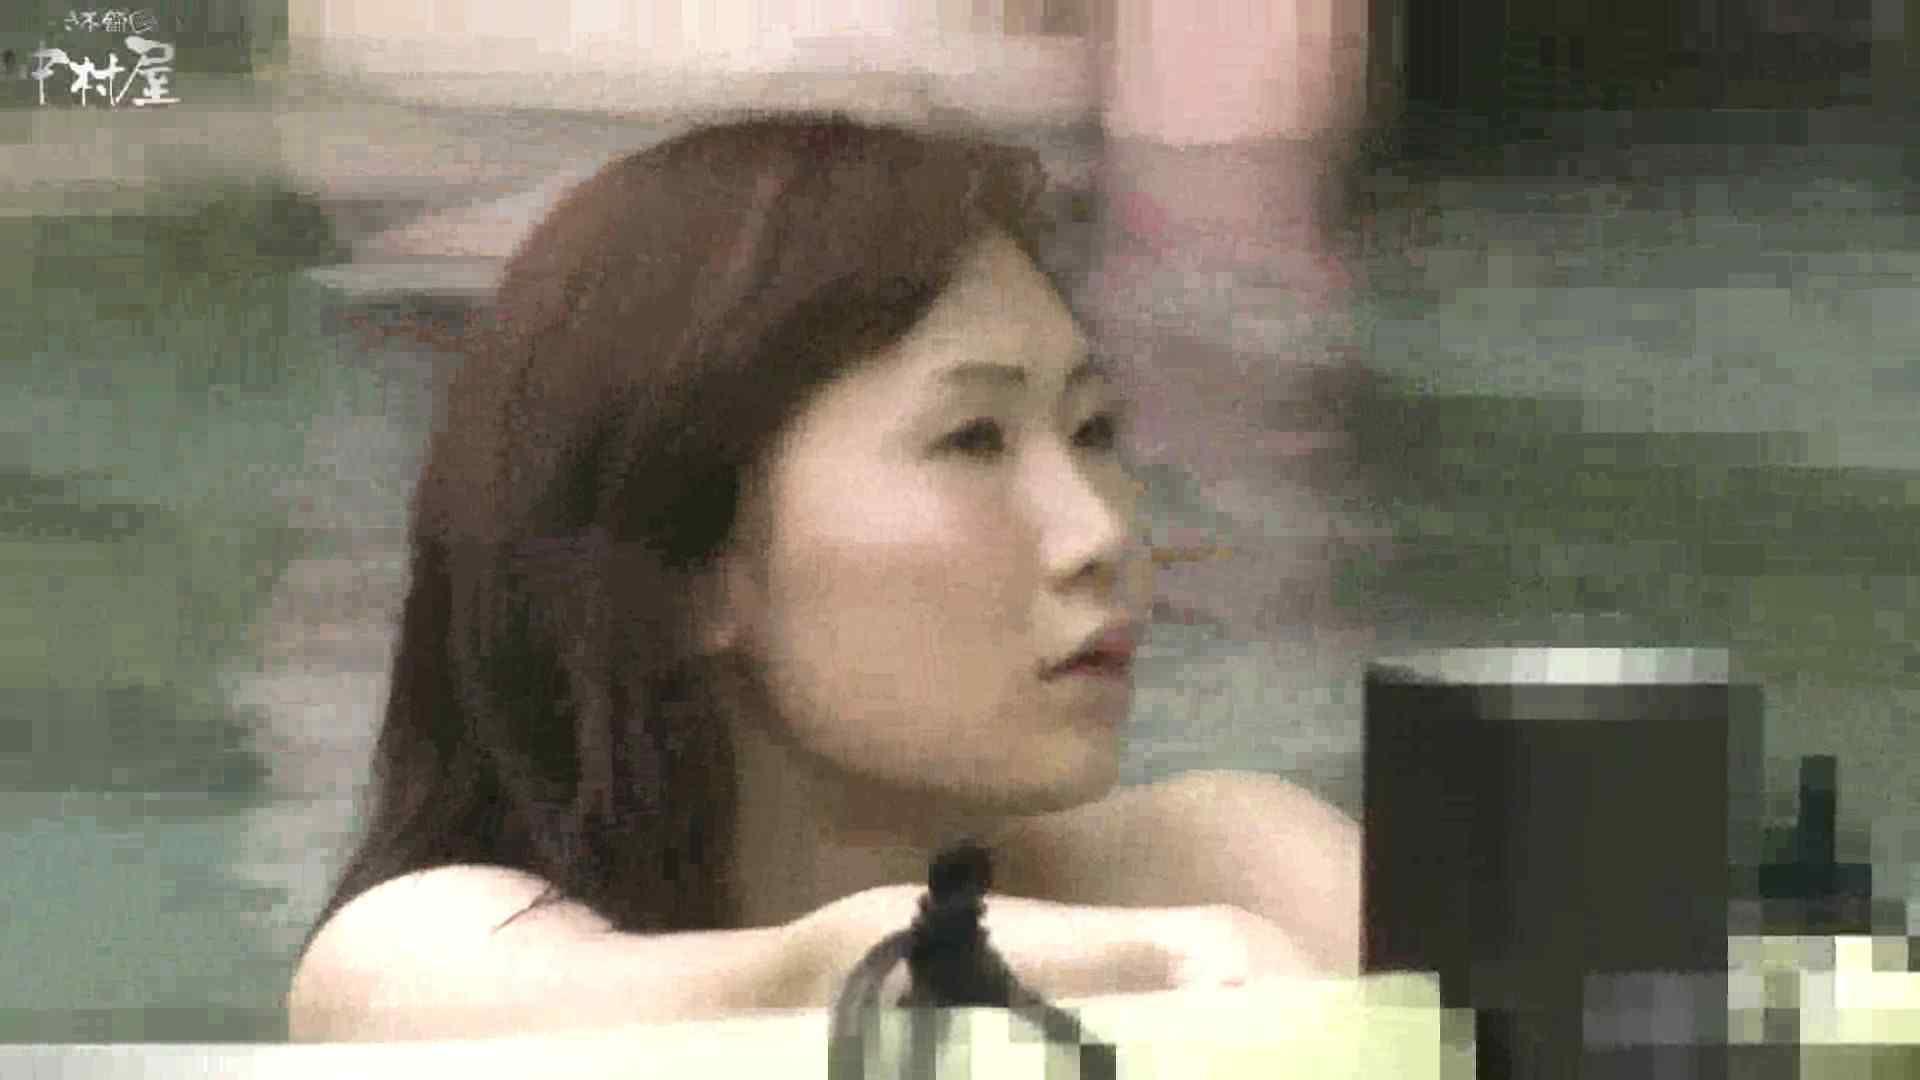 Aquaな露天風呂Vol.877潜入盗撮露天風呂十三判湯 其の二 HなOL AV無料 106pic 68